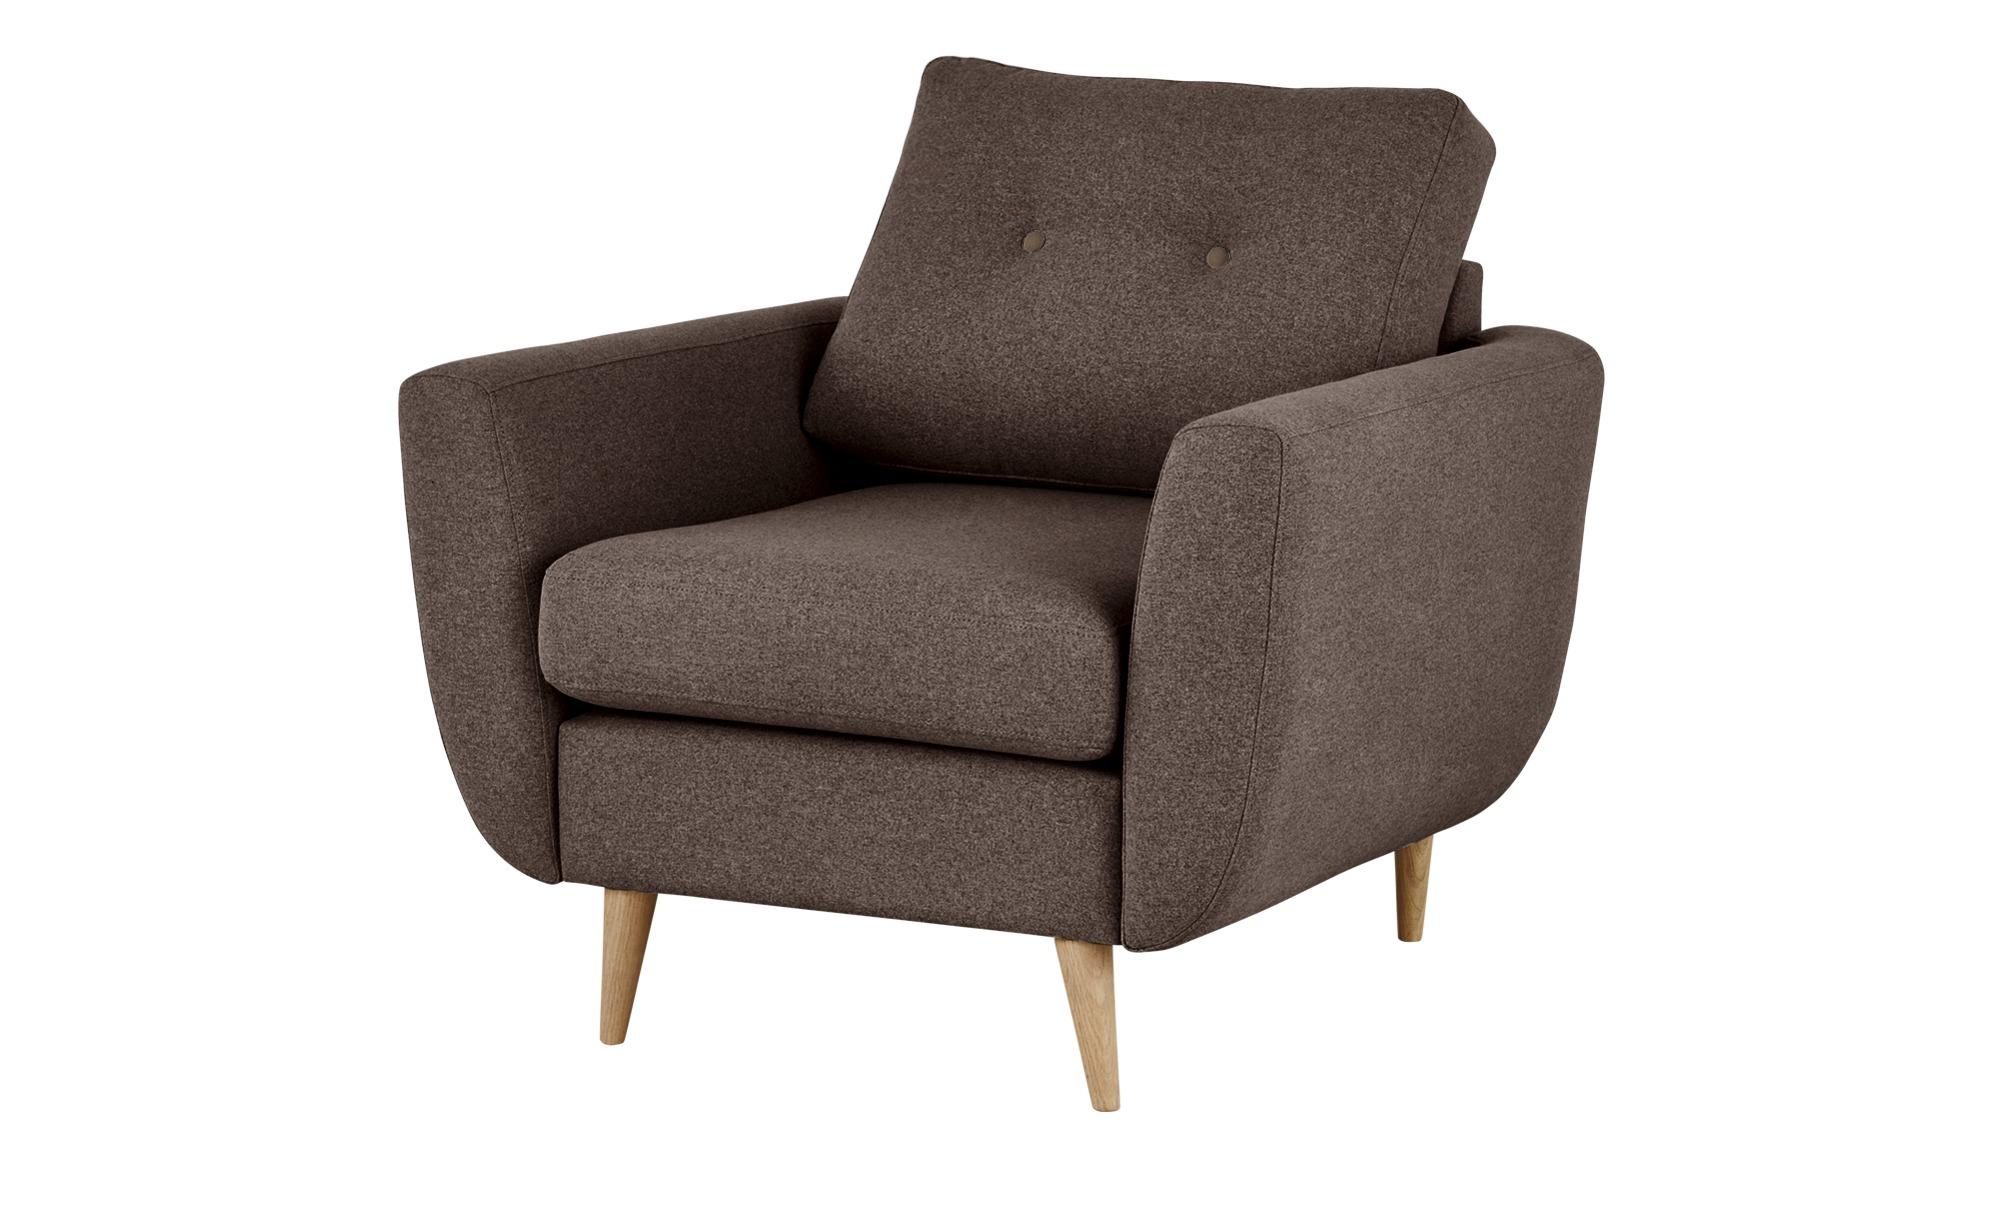 finya Retro-Sessel braun - Stoff Harris ¦ braun ¦ Maße (cm): B: 88 H: 85 T: 85 Polstermöbel > Sessel > Polstersessel - Höffner